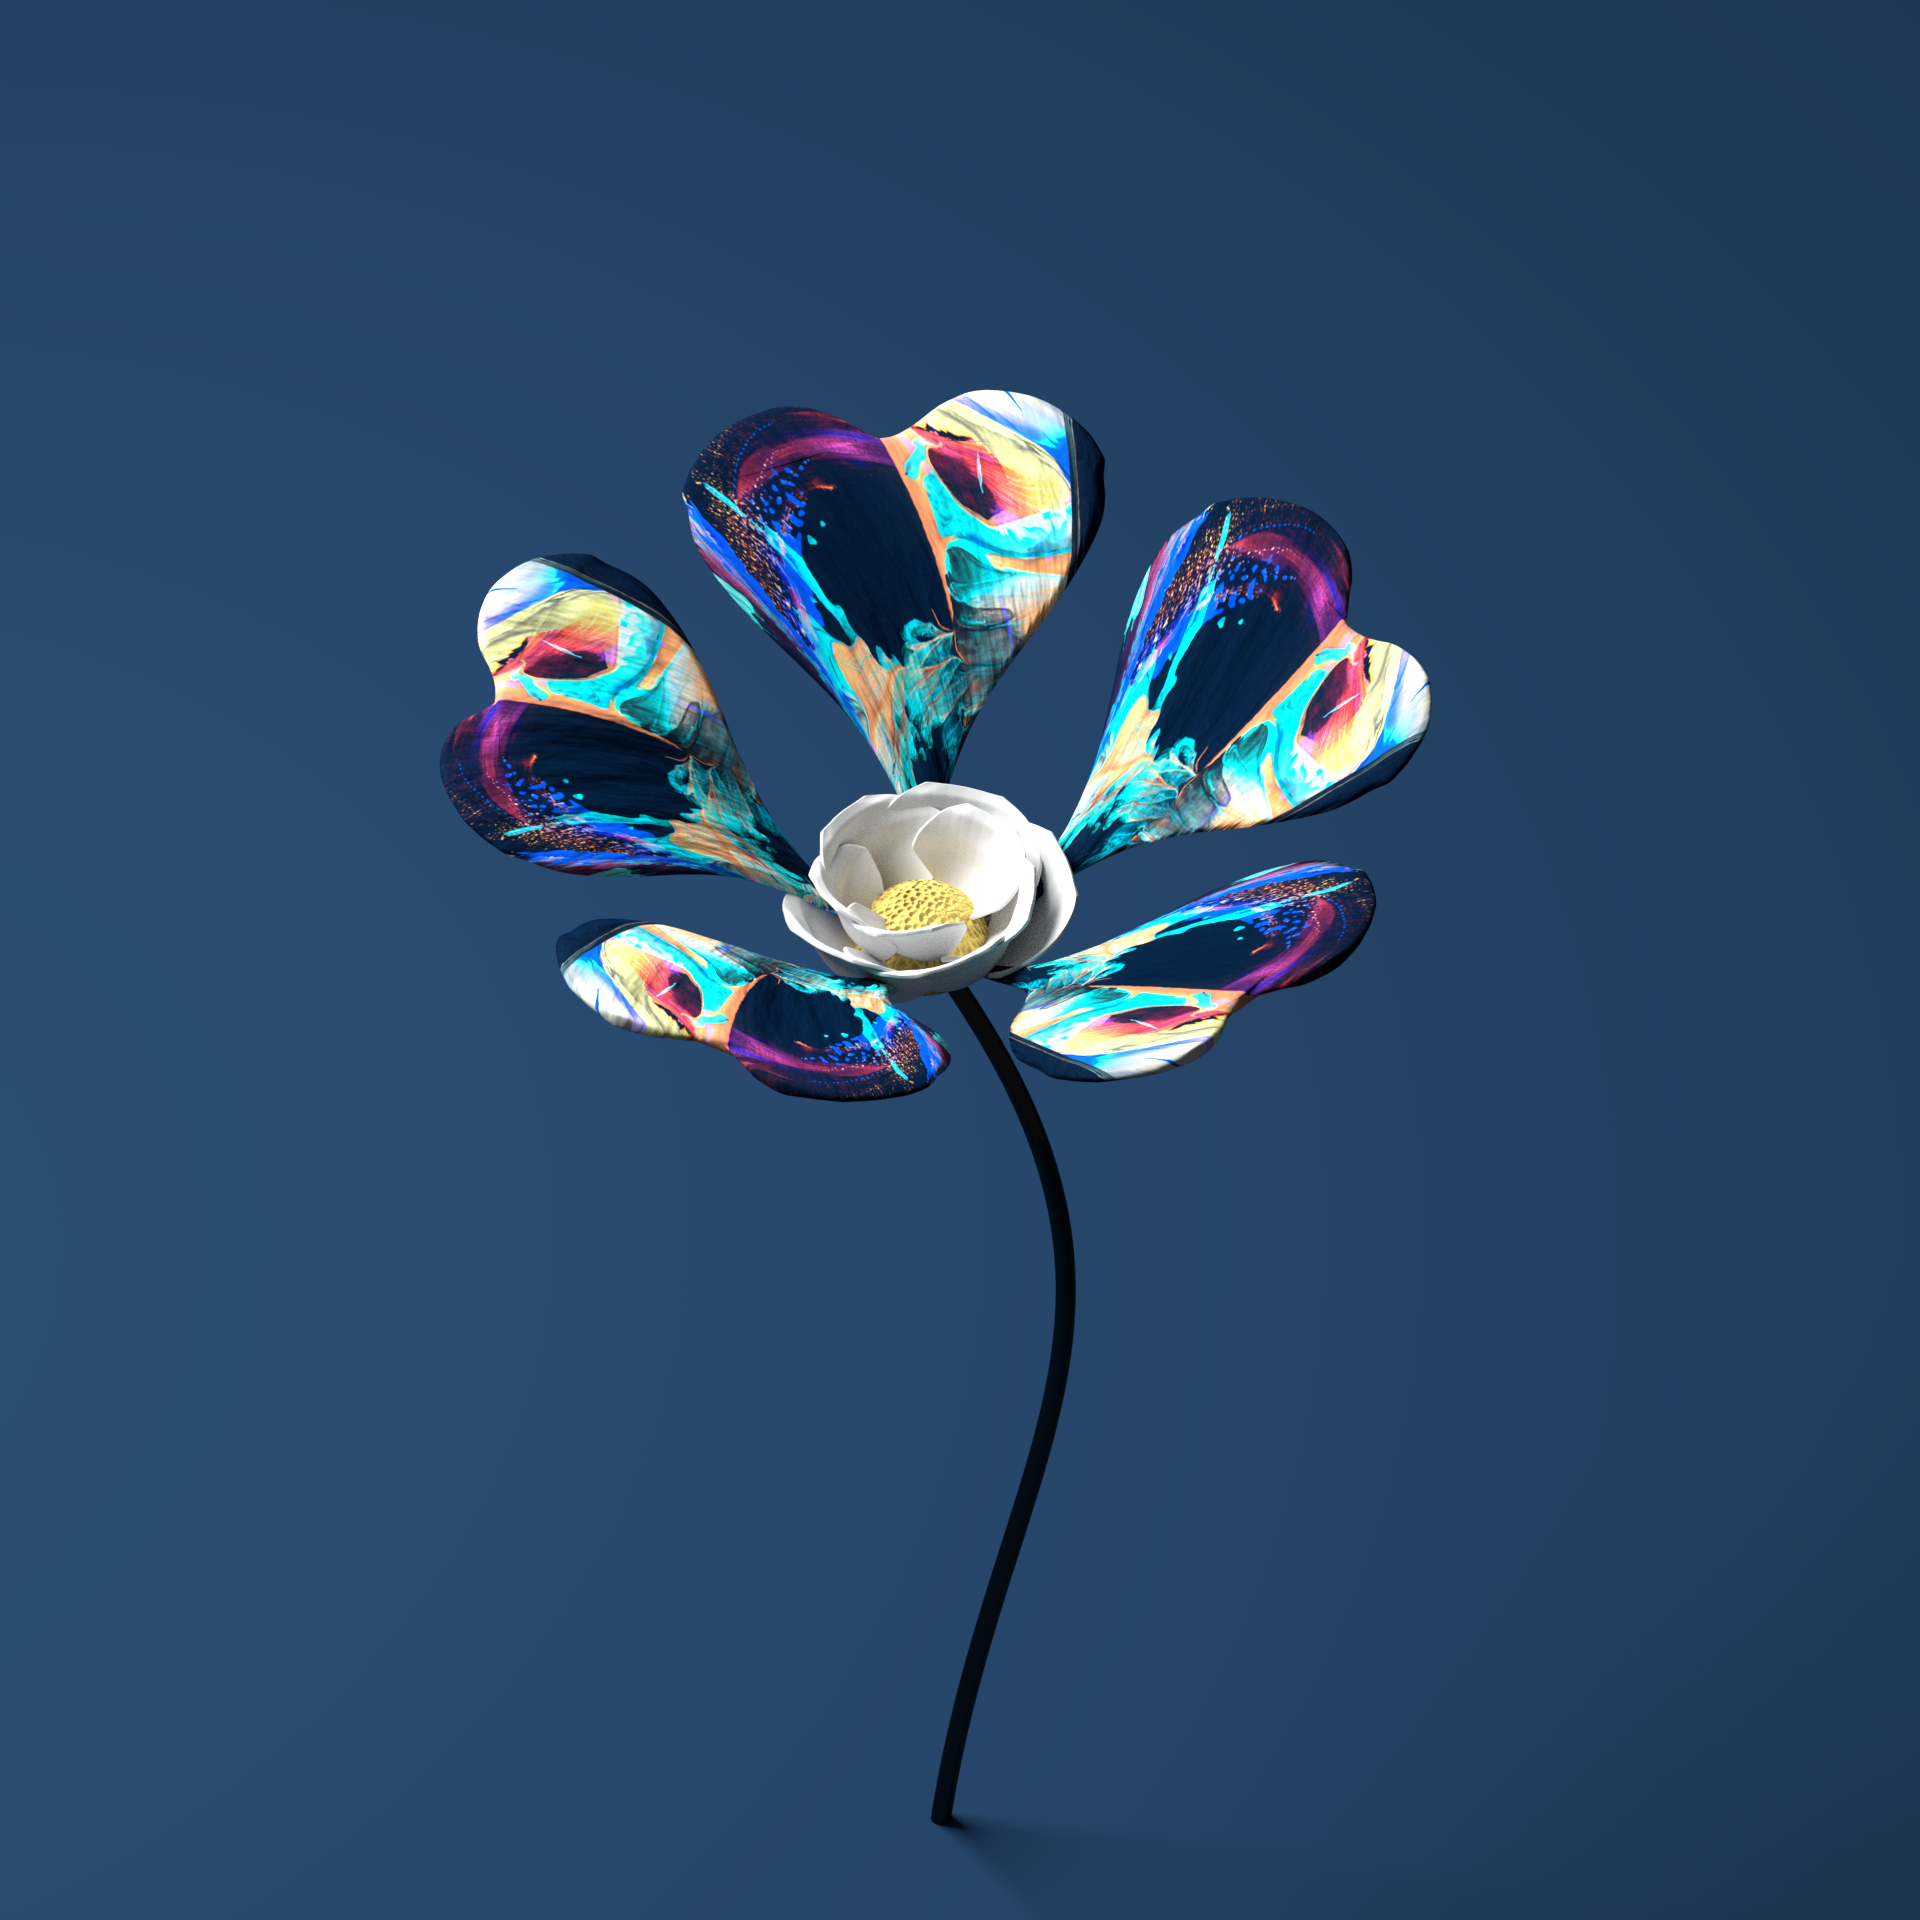 3D Art by reddit user: henrybacon A very Zawada/Flume vibe